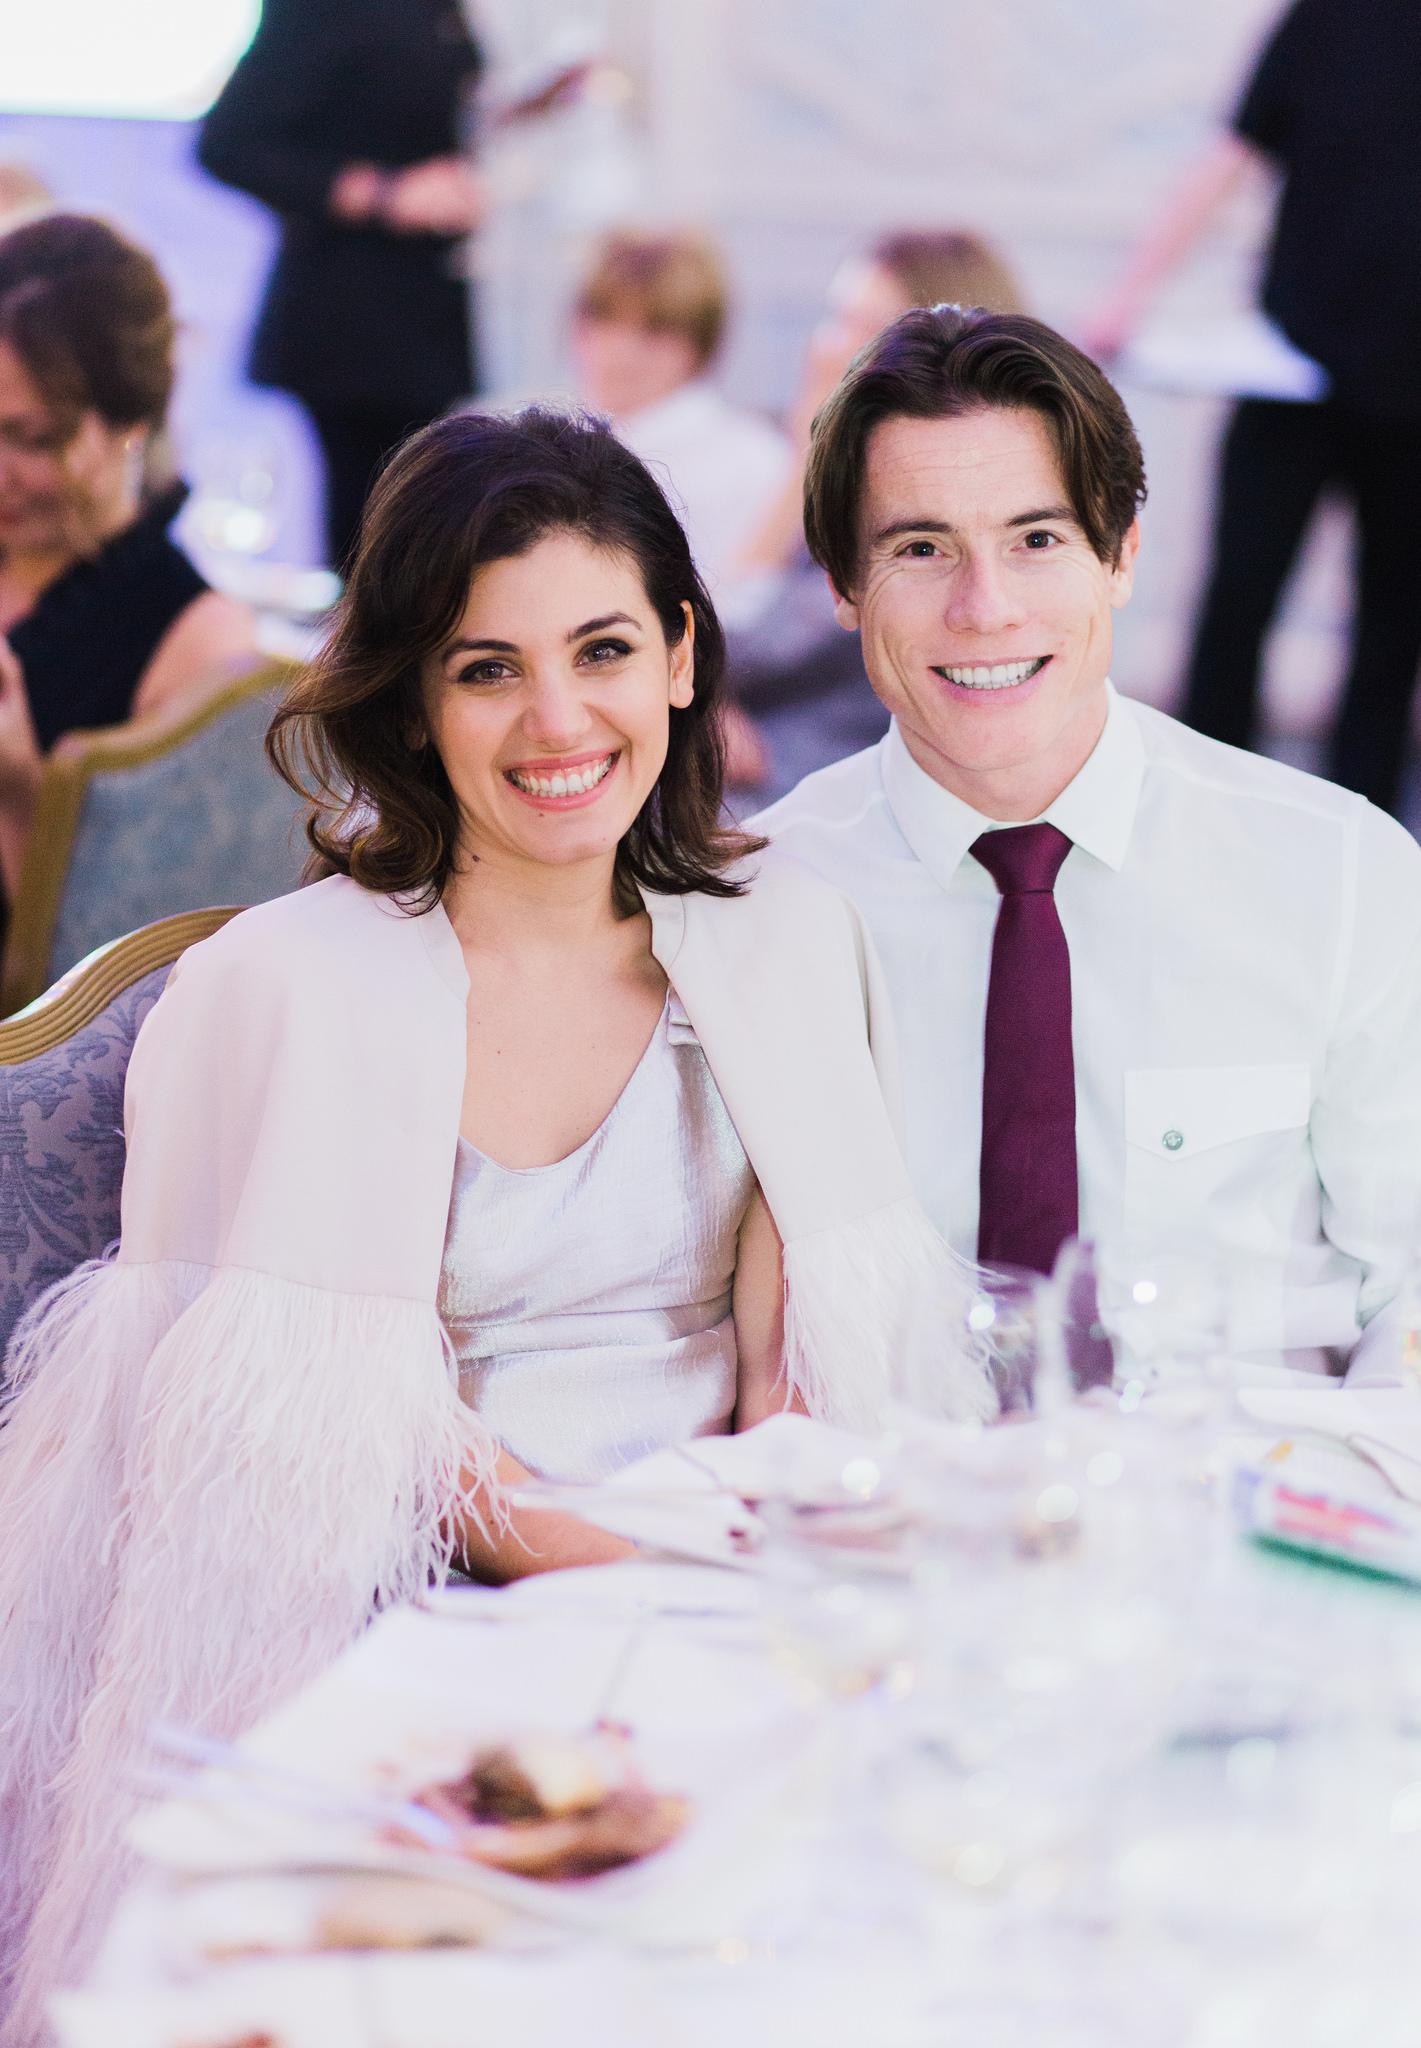 Кэти Мелуа и ее муж Джеймс Тоузленд